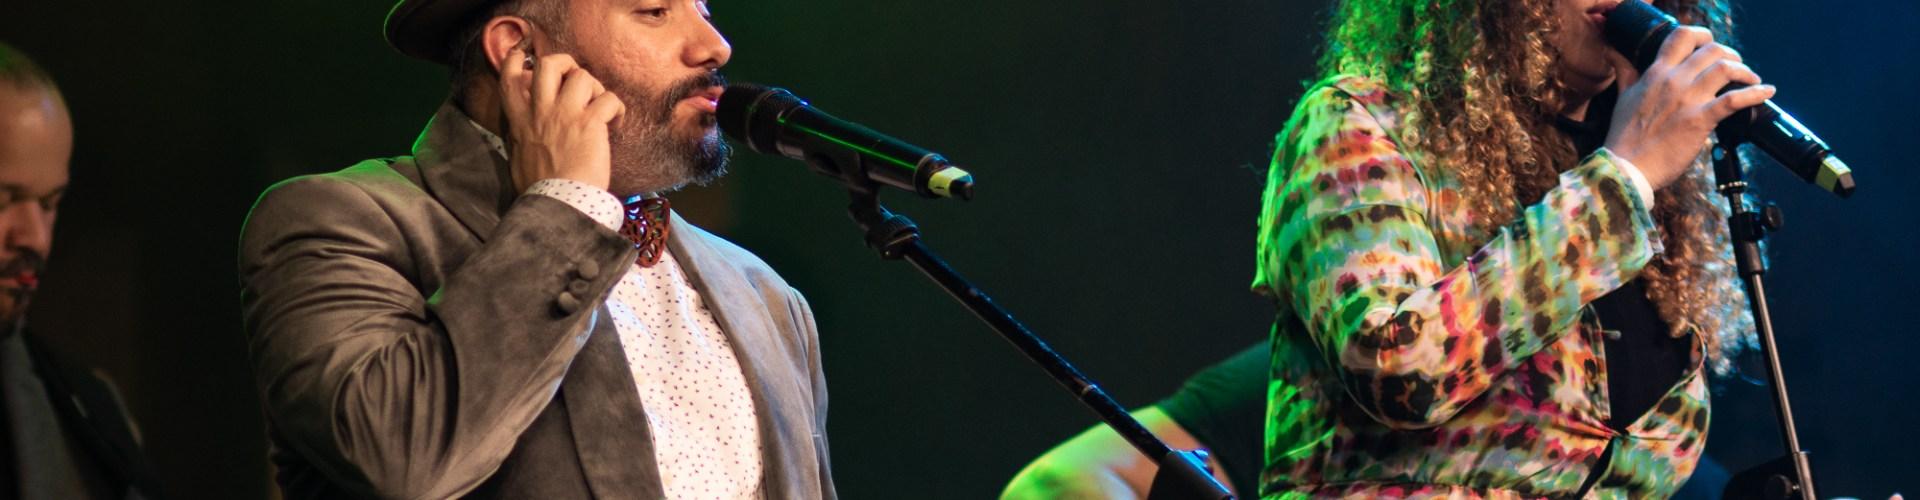 Pavel Núñez presenta su repertorio musical